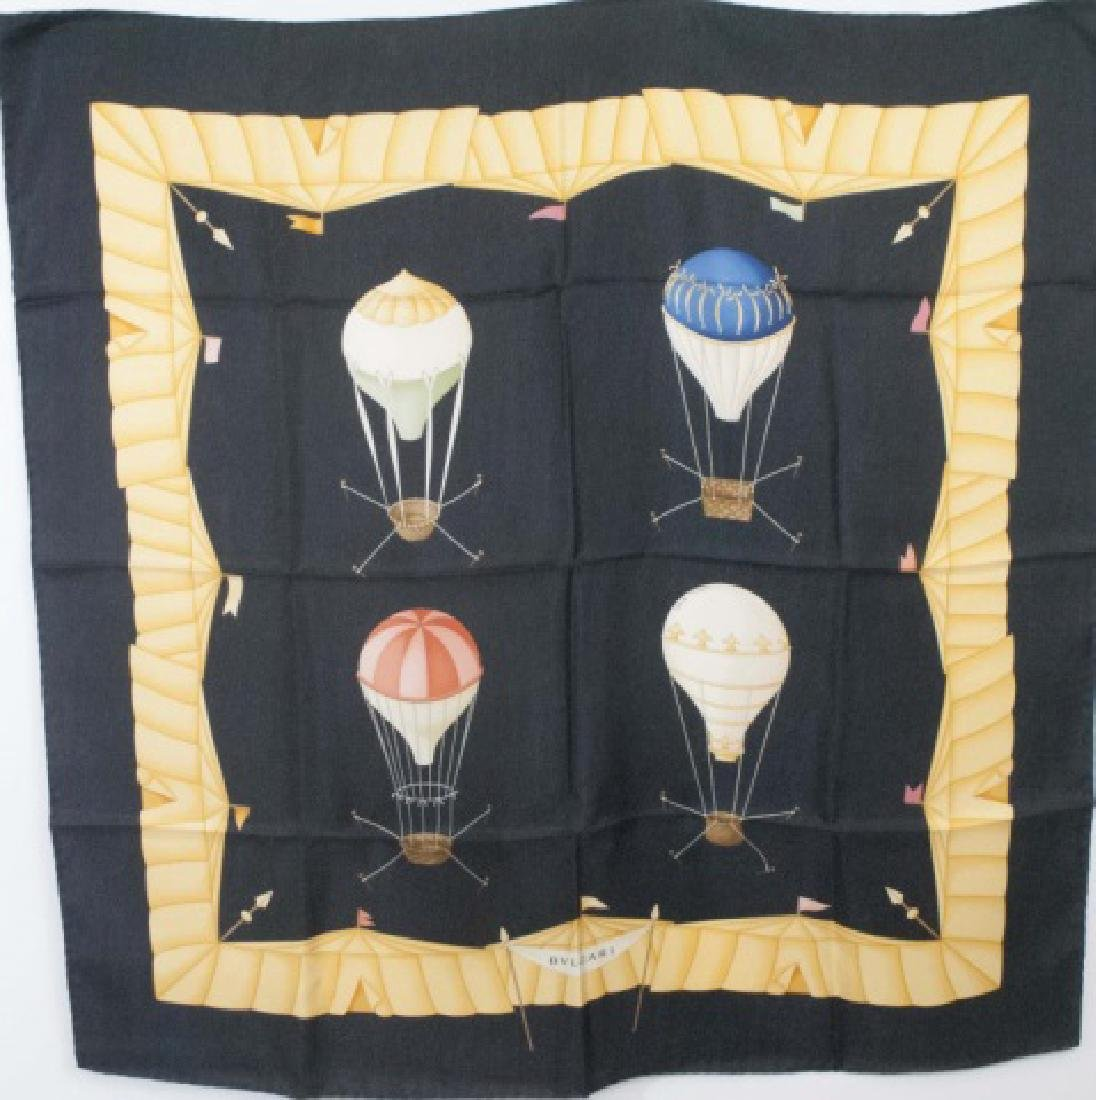 Bulgari Silk Scarf - Design by Davide Pizzigoni